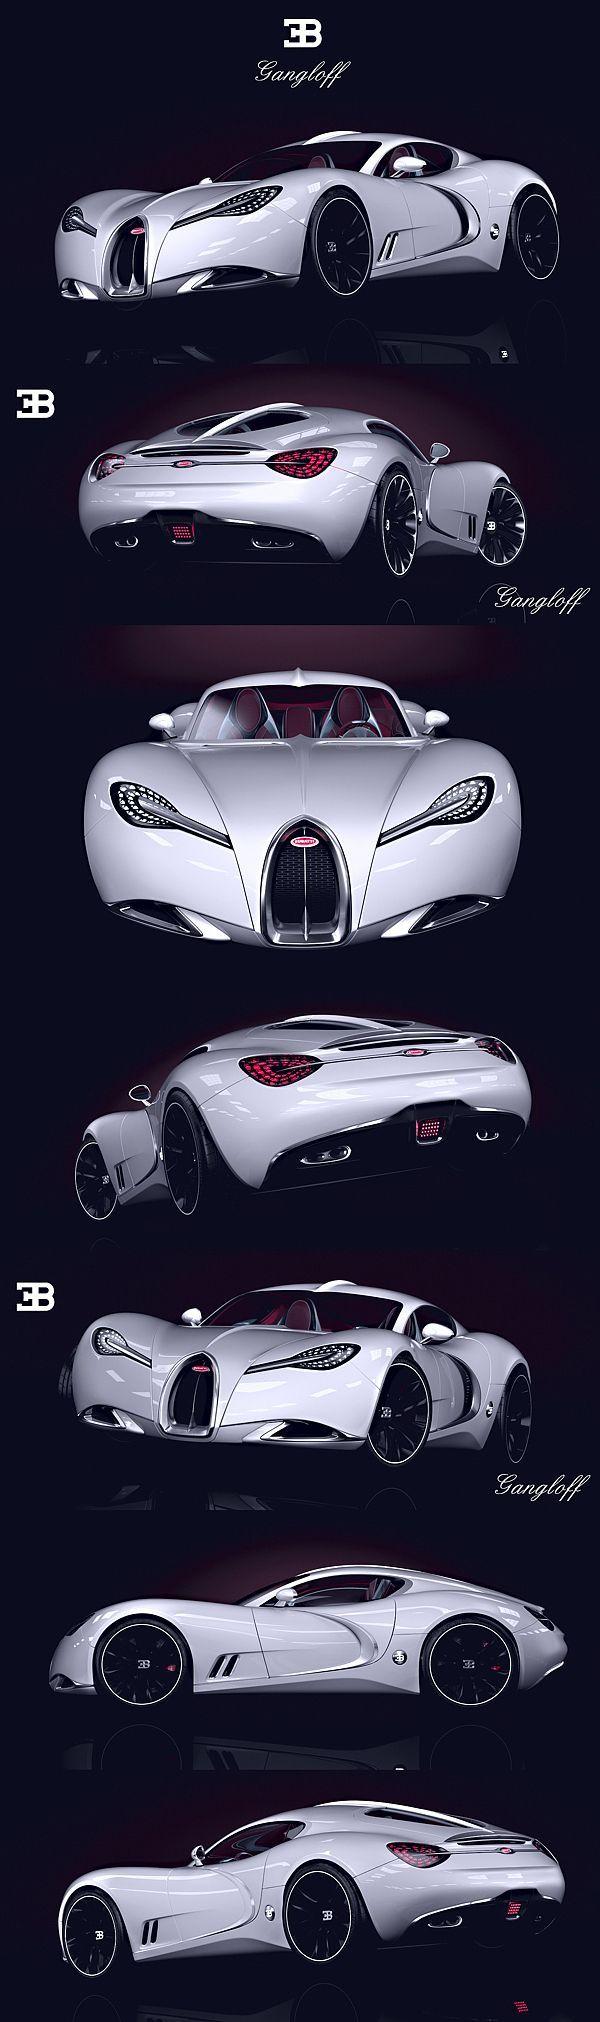 Bugatti Gangloff Concept by Paweu0142 Czyu017cewski